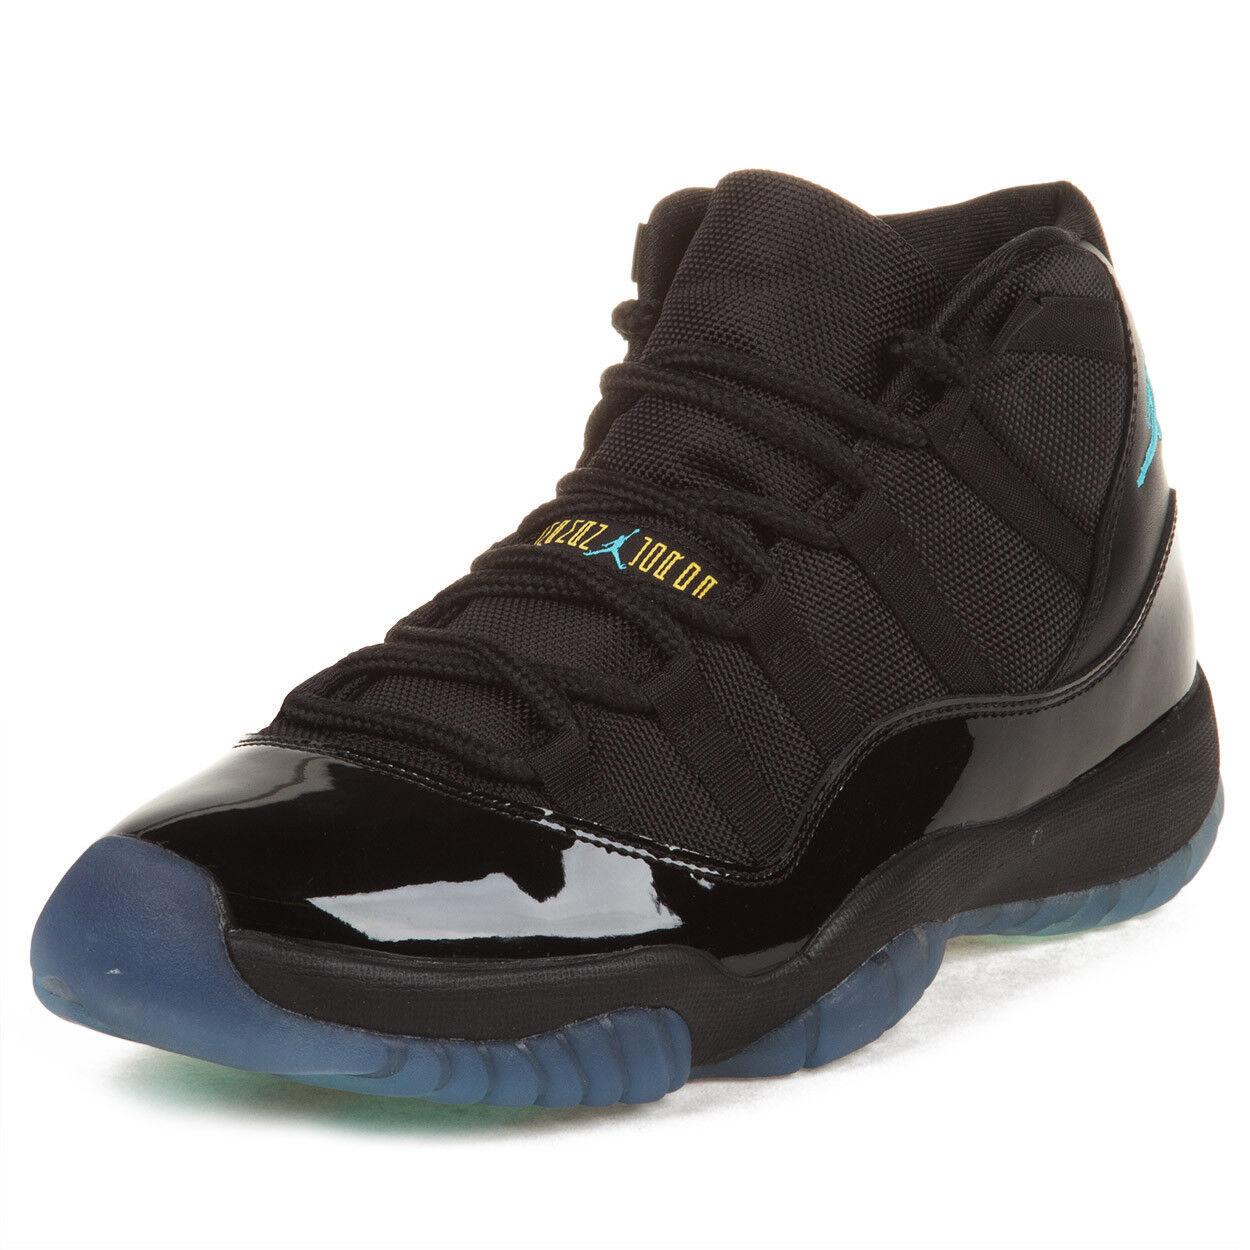 Nike Mens Air Jordan 11 Retro Black Gamma bluee 378037-006